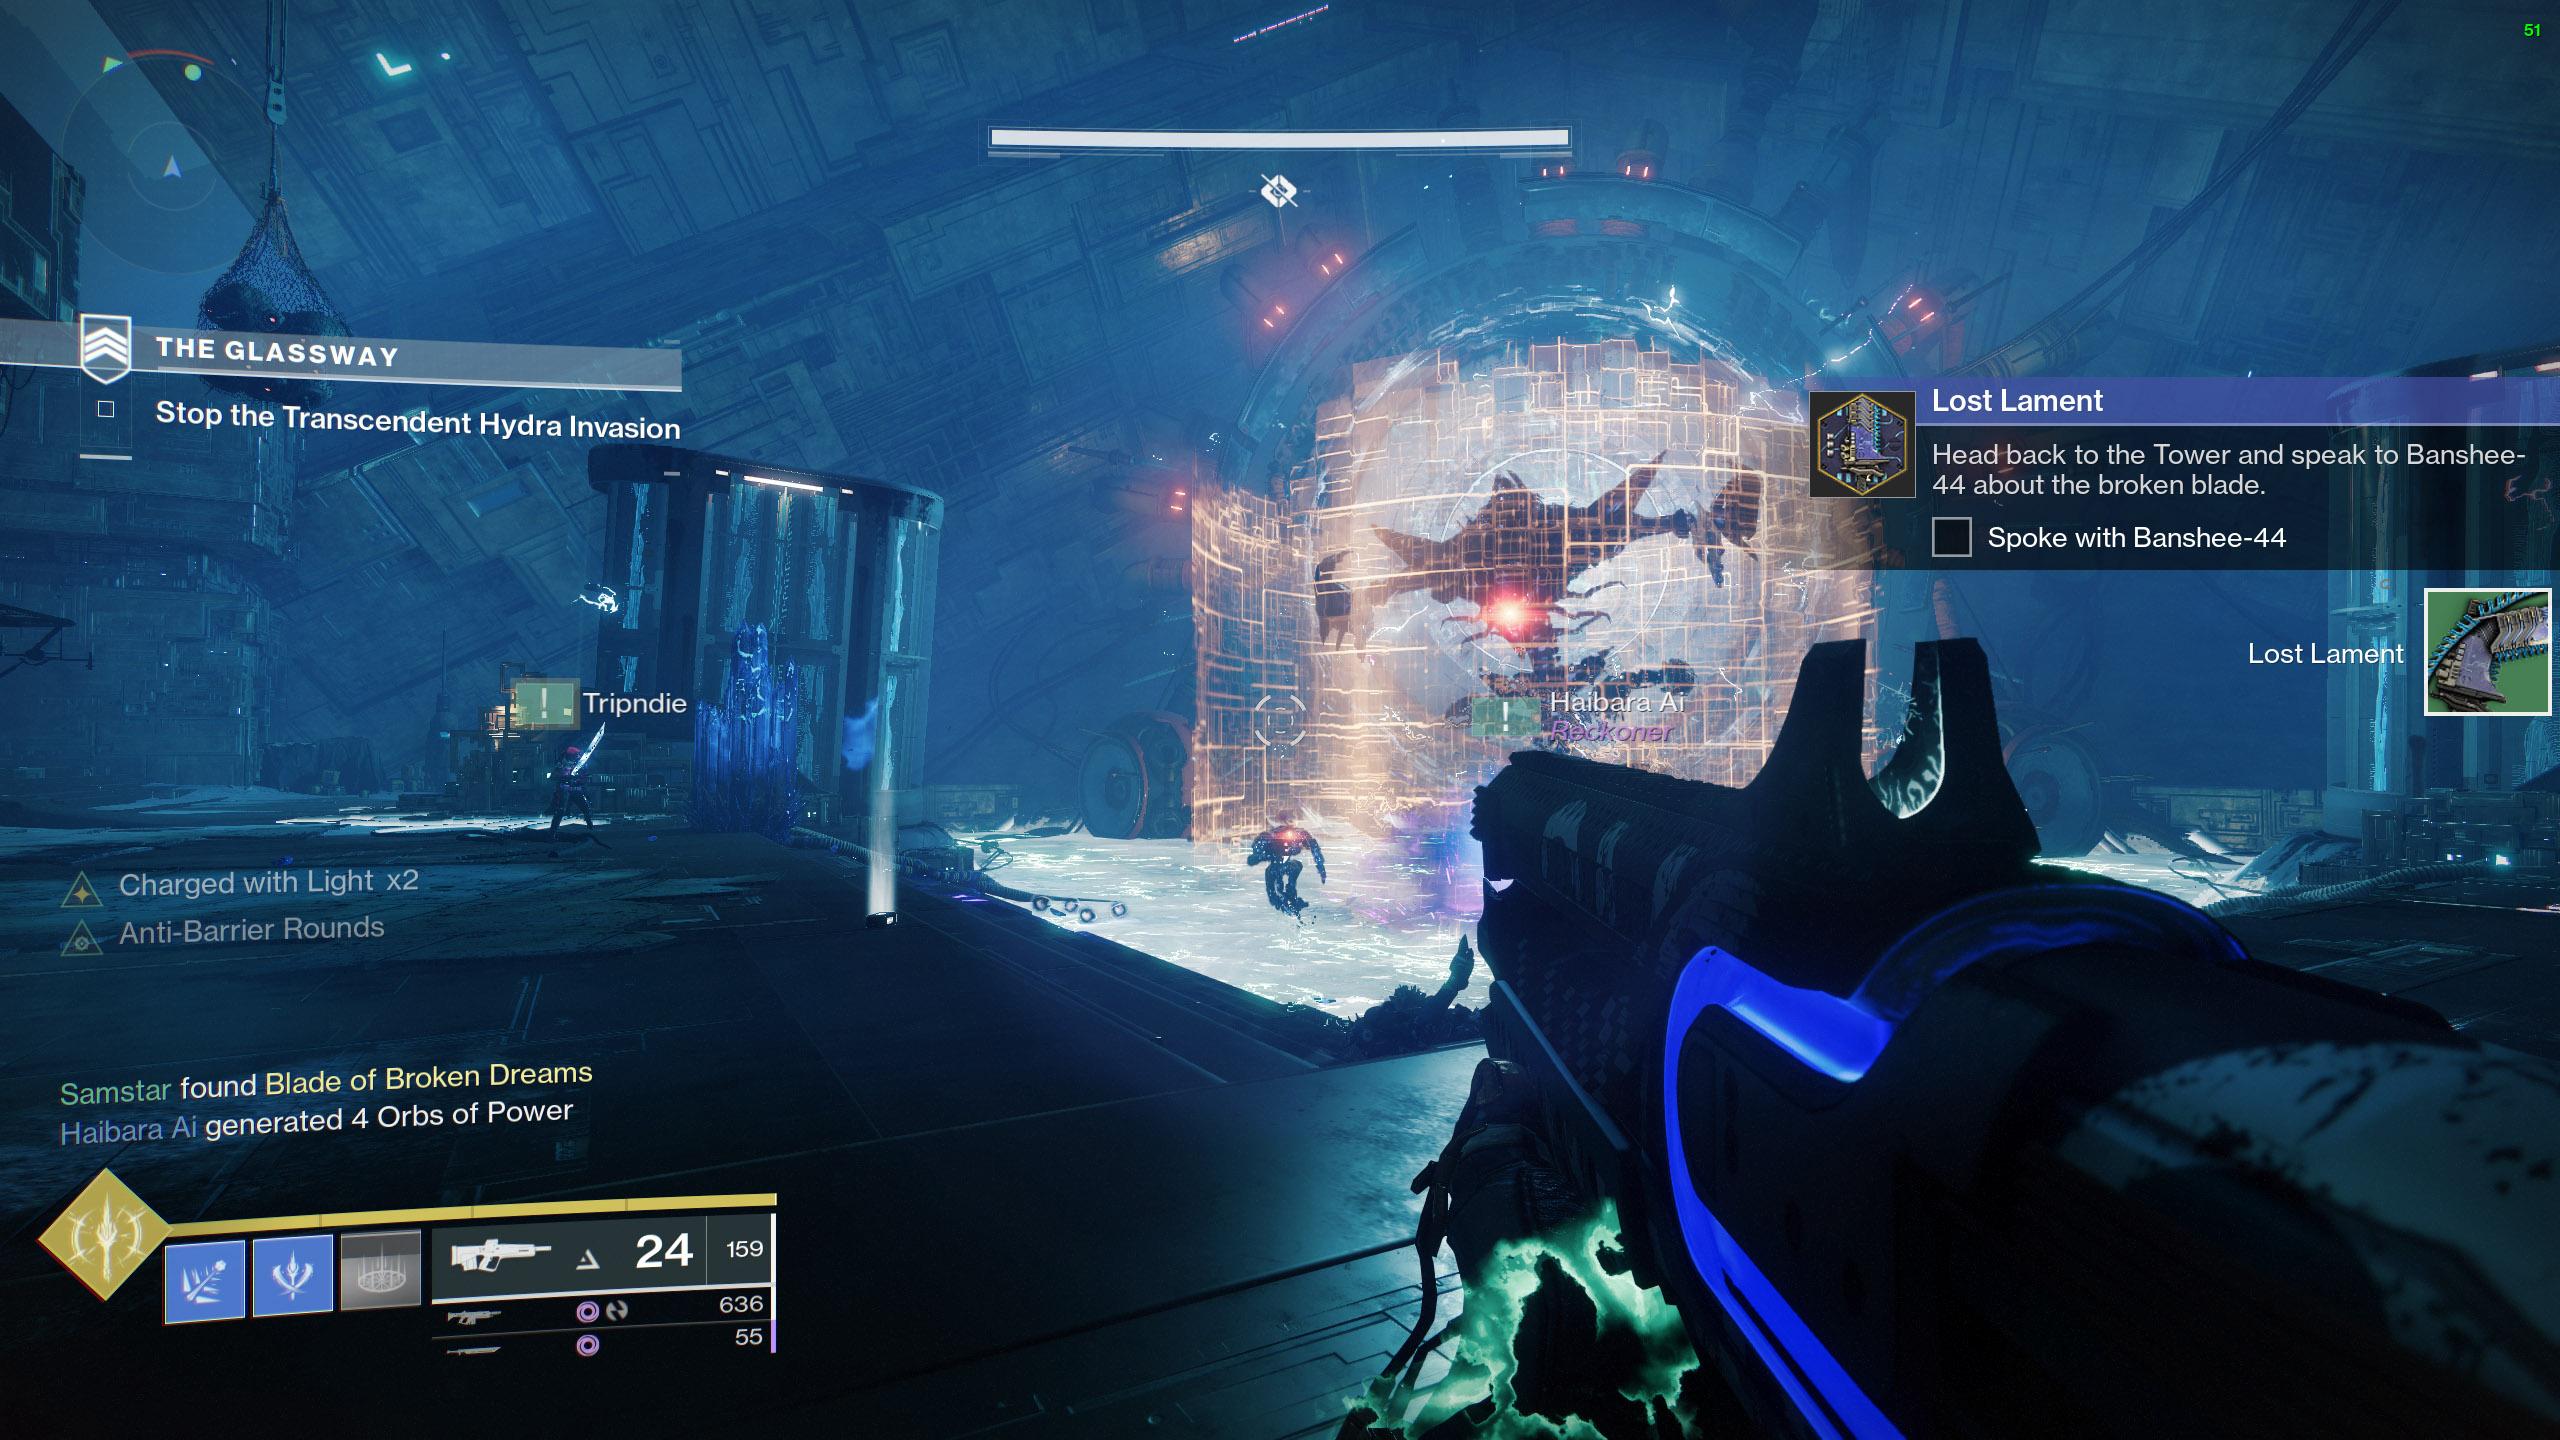 destiny 2 rescue the past lost lament glassway strike